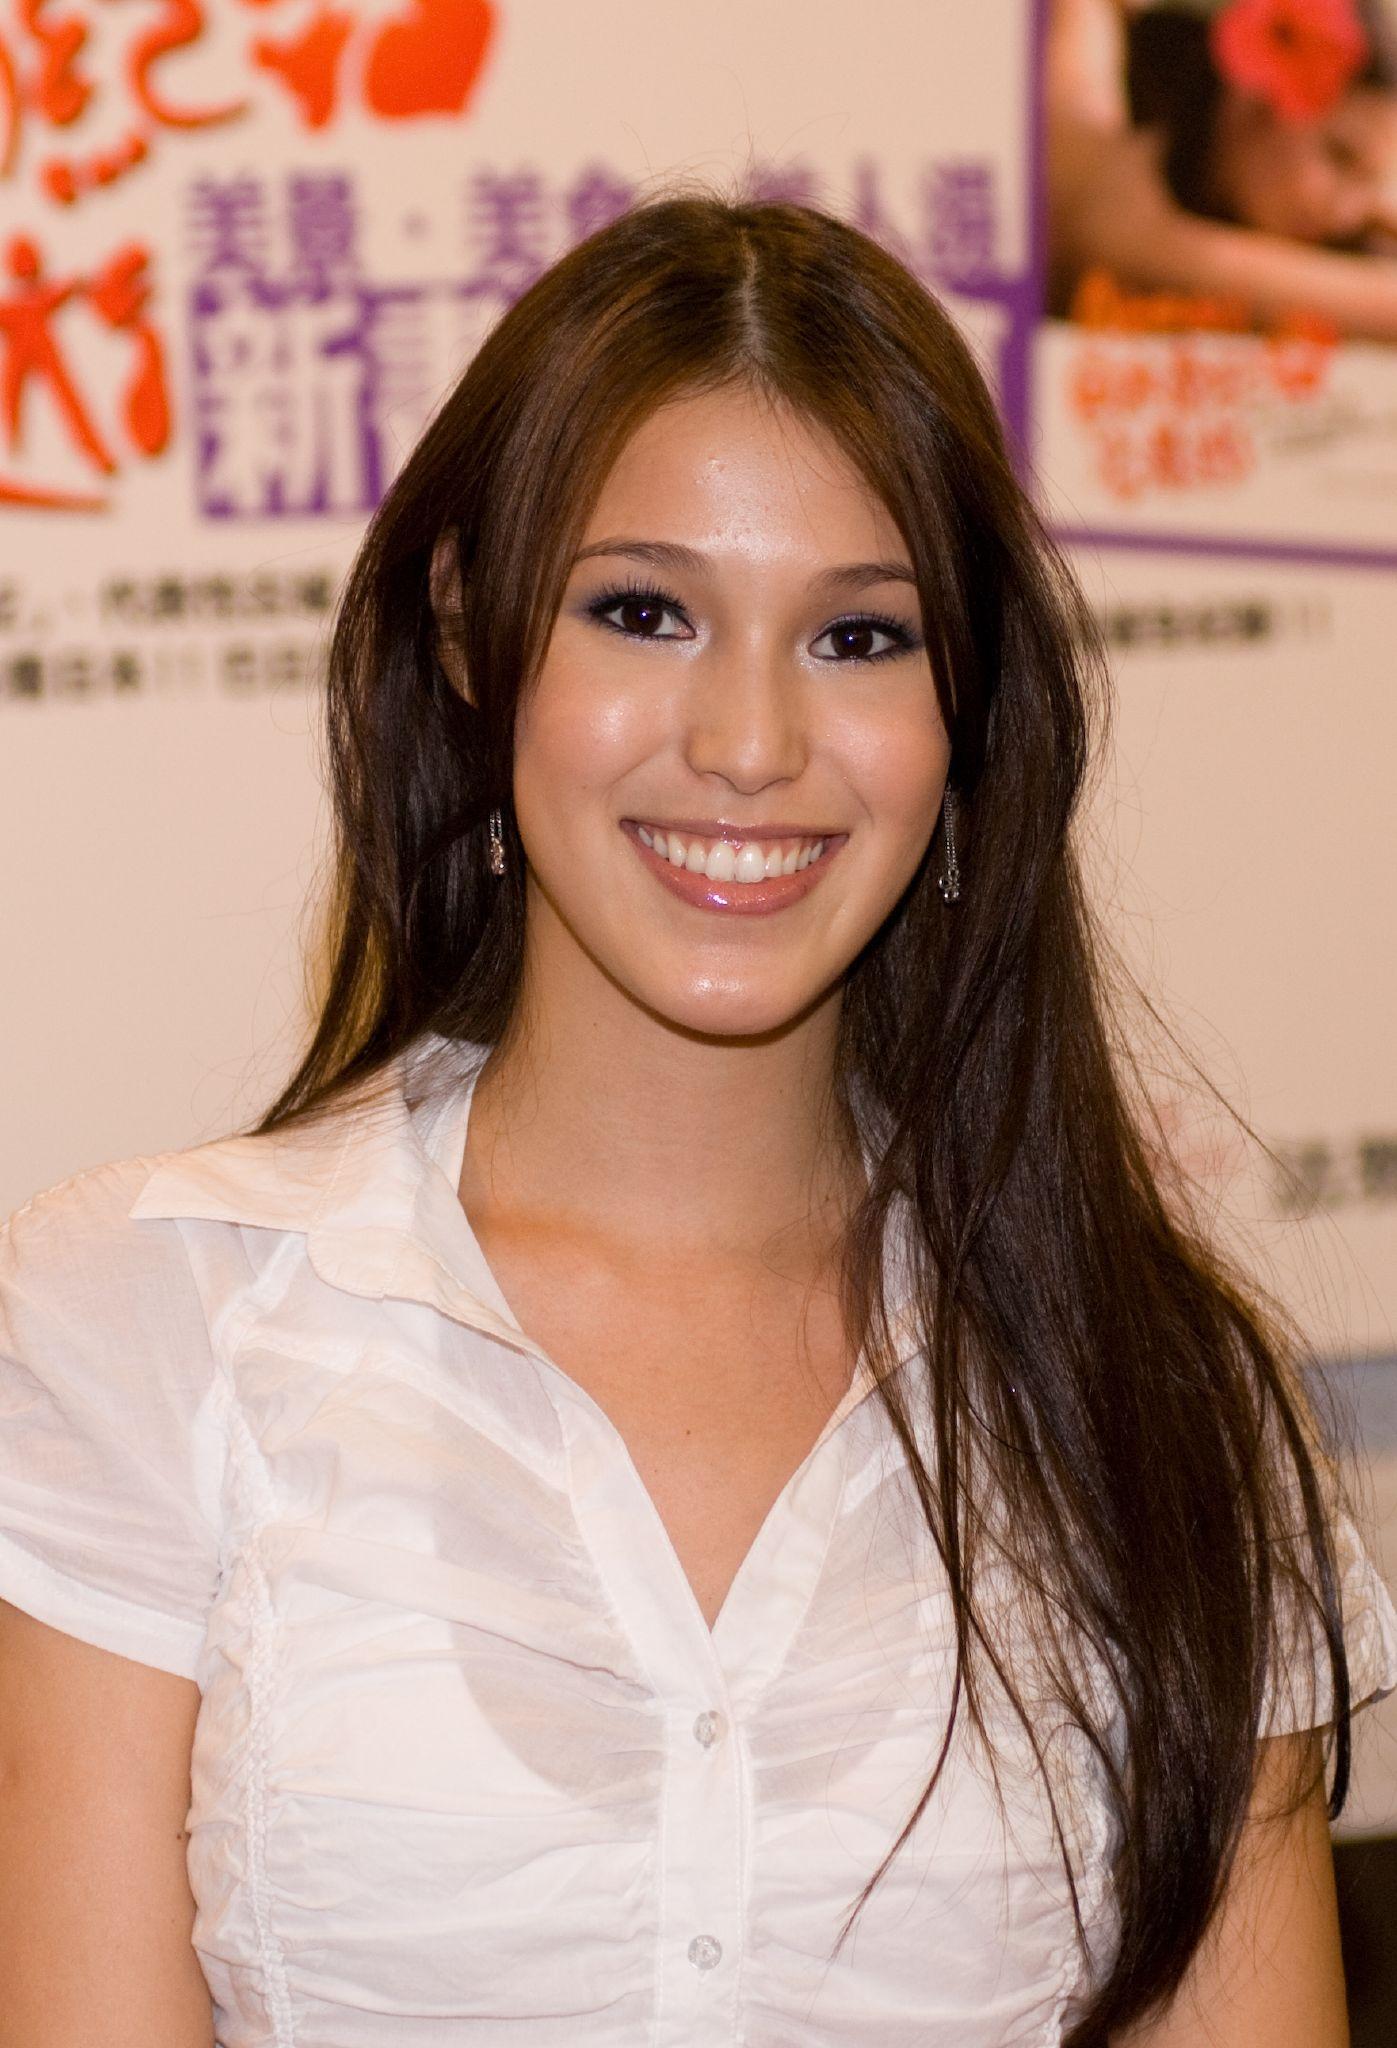 File:Akemi Barbara Katsuki at her new book presentation 20071117.jpg - 維基百科,自由的百科全書